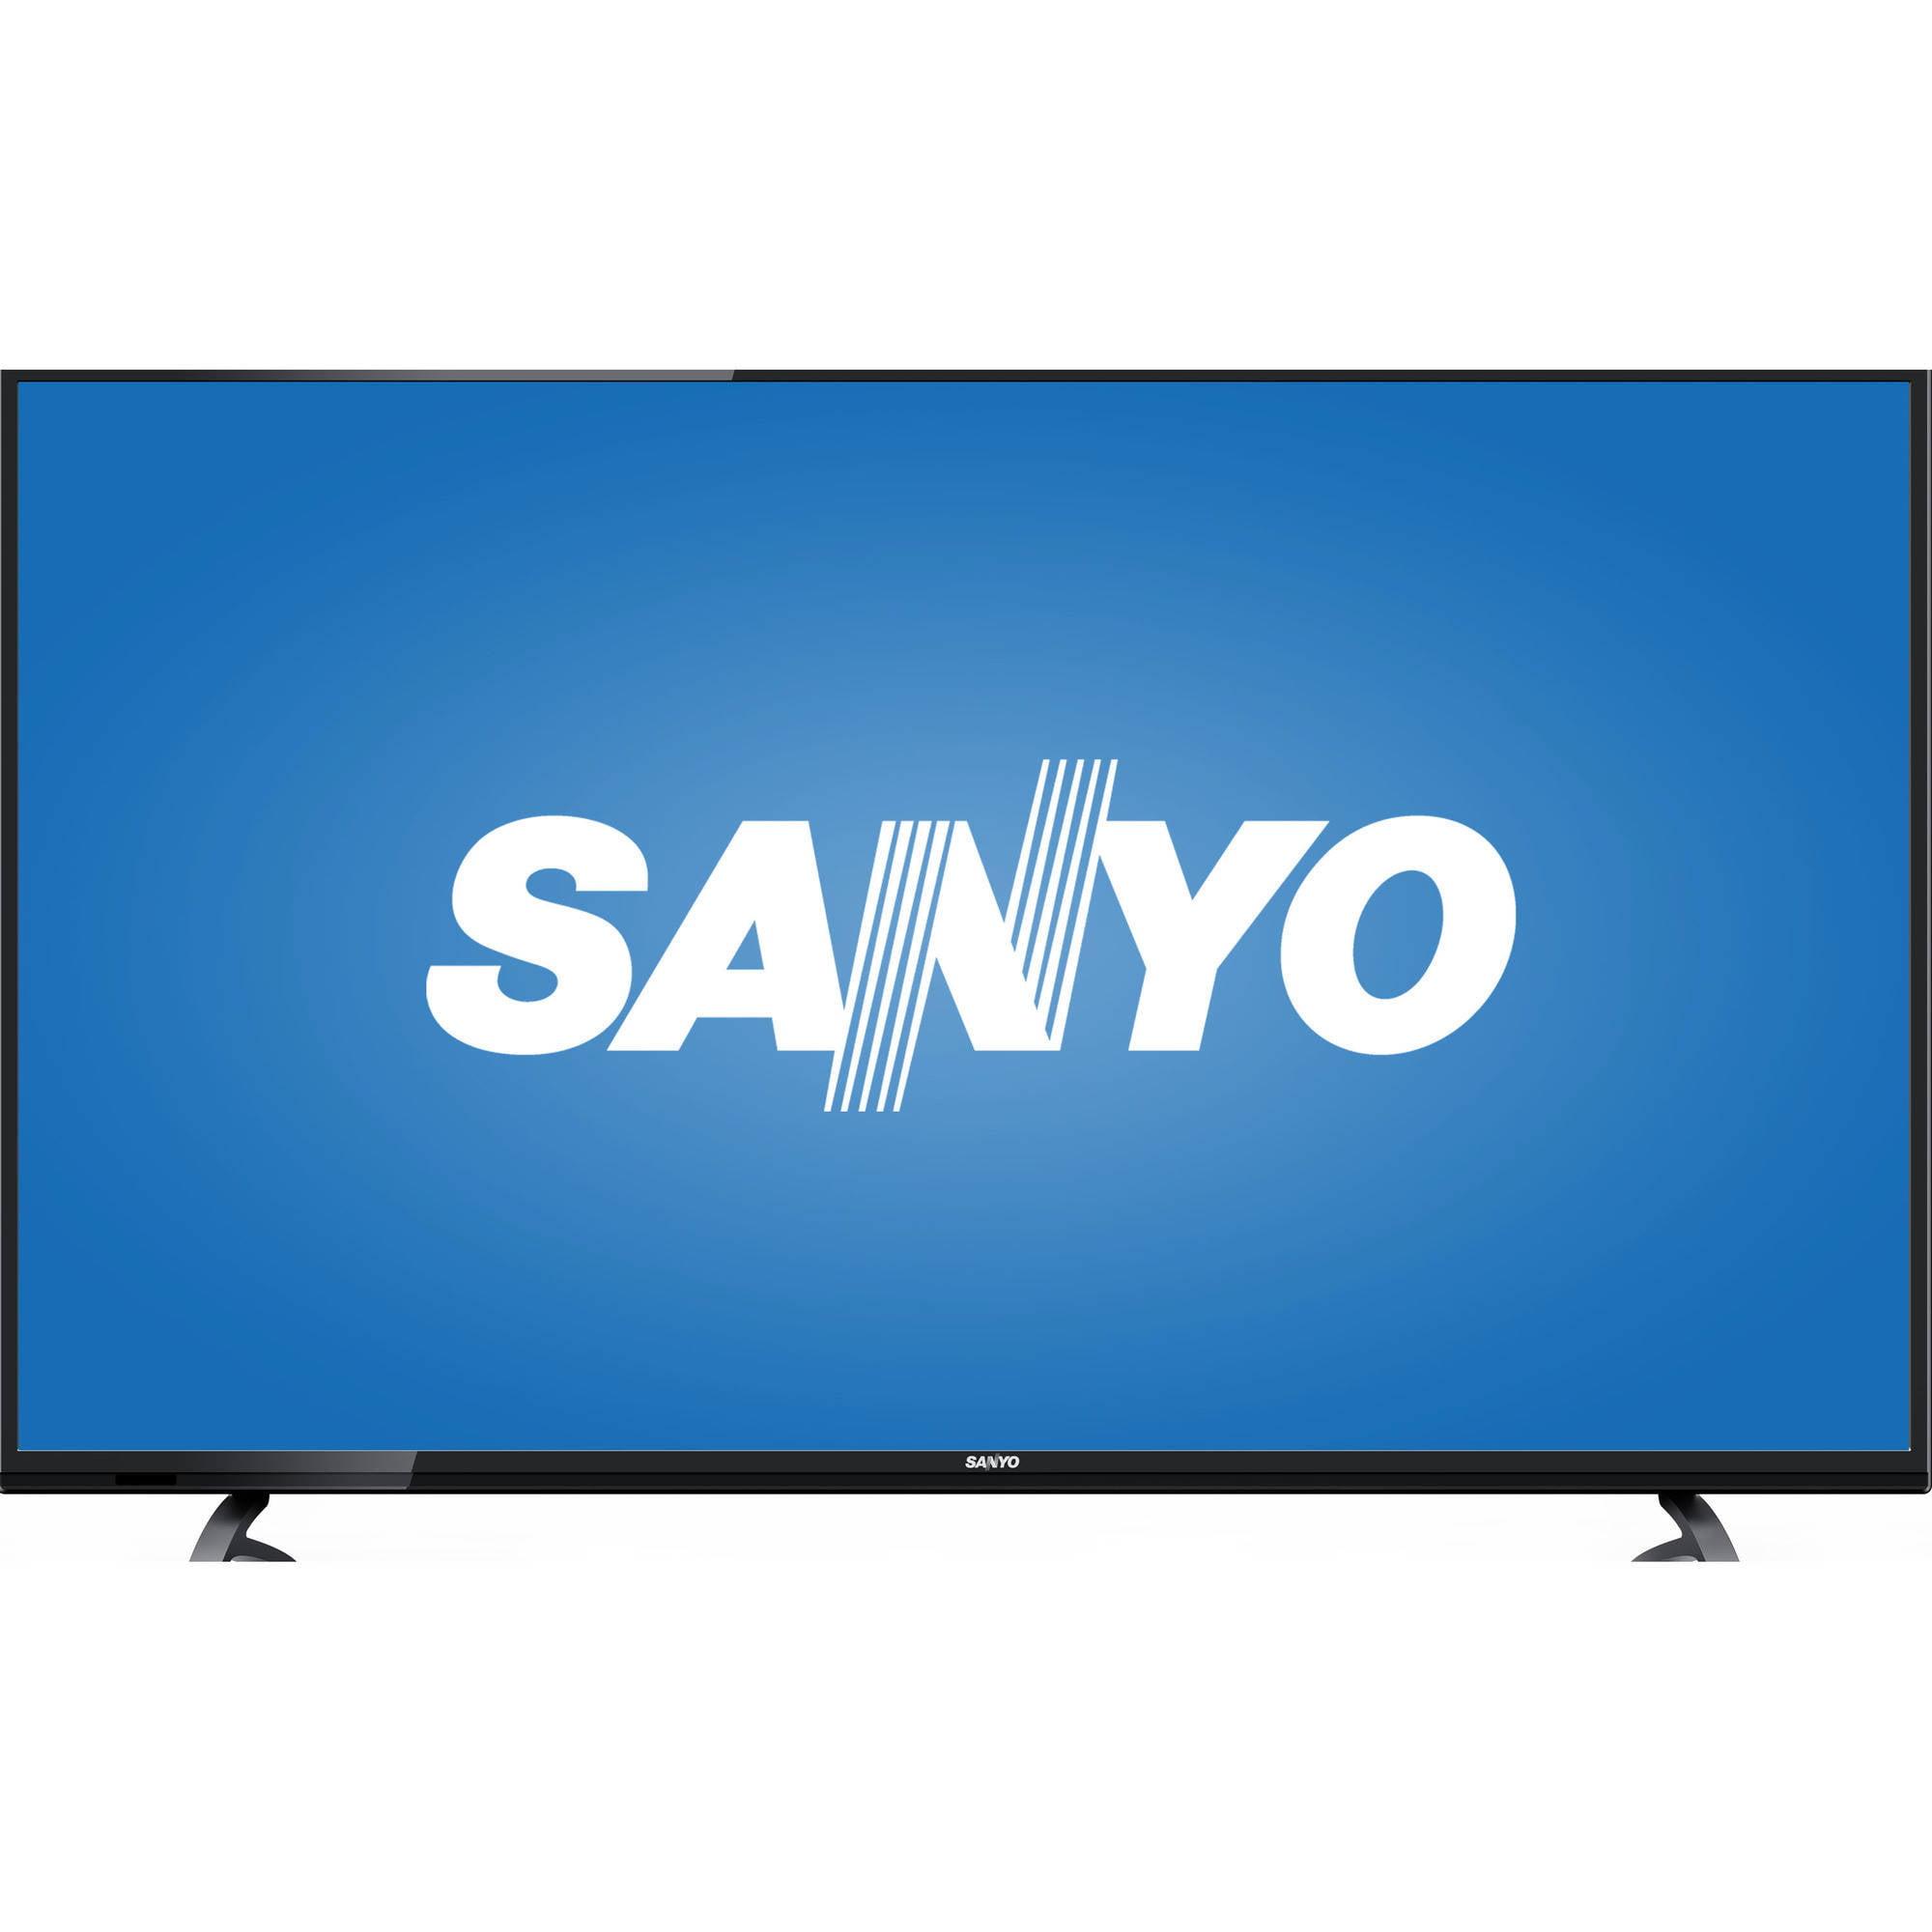 "Sanyo FW50C85T 50"" 4K Ultra HD 2160p 60Hz LED LCD Smart HDTV (4K x 2K)"